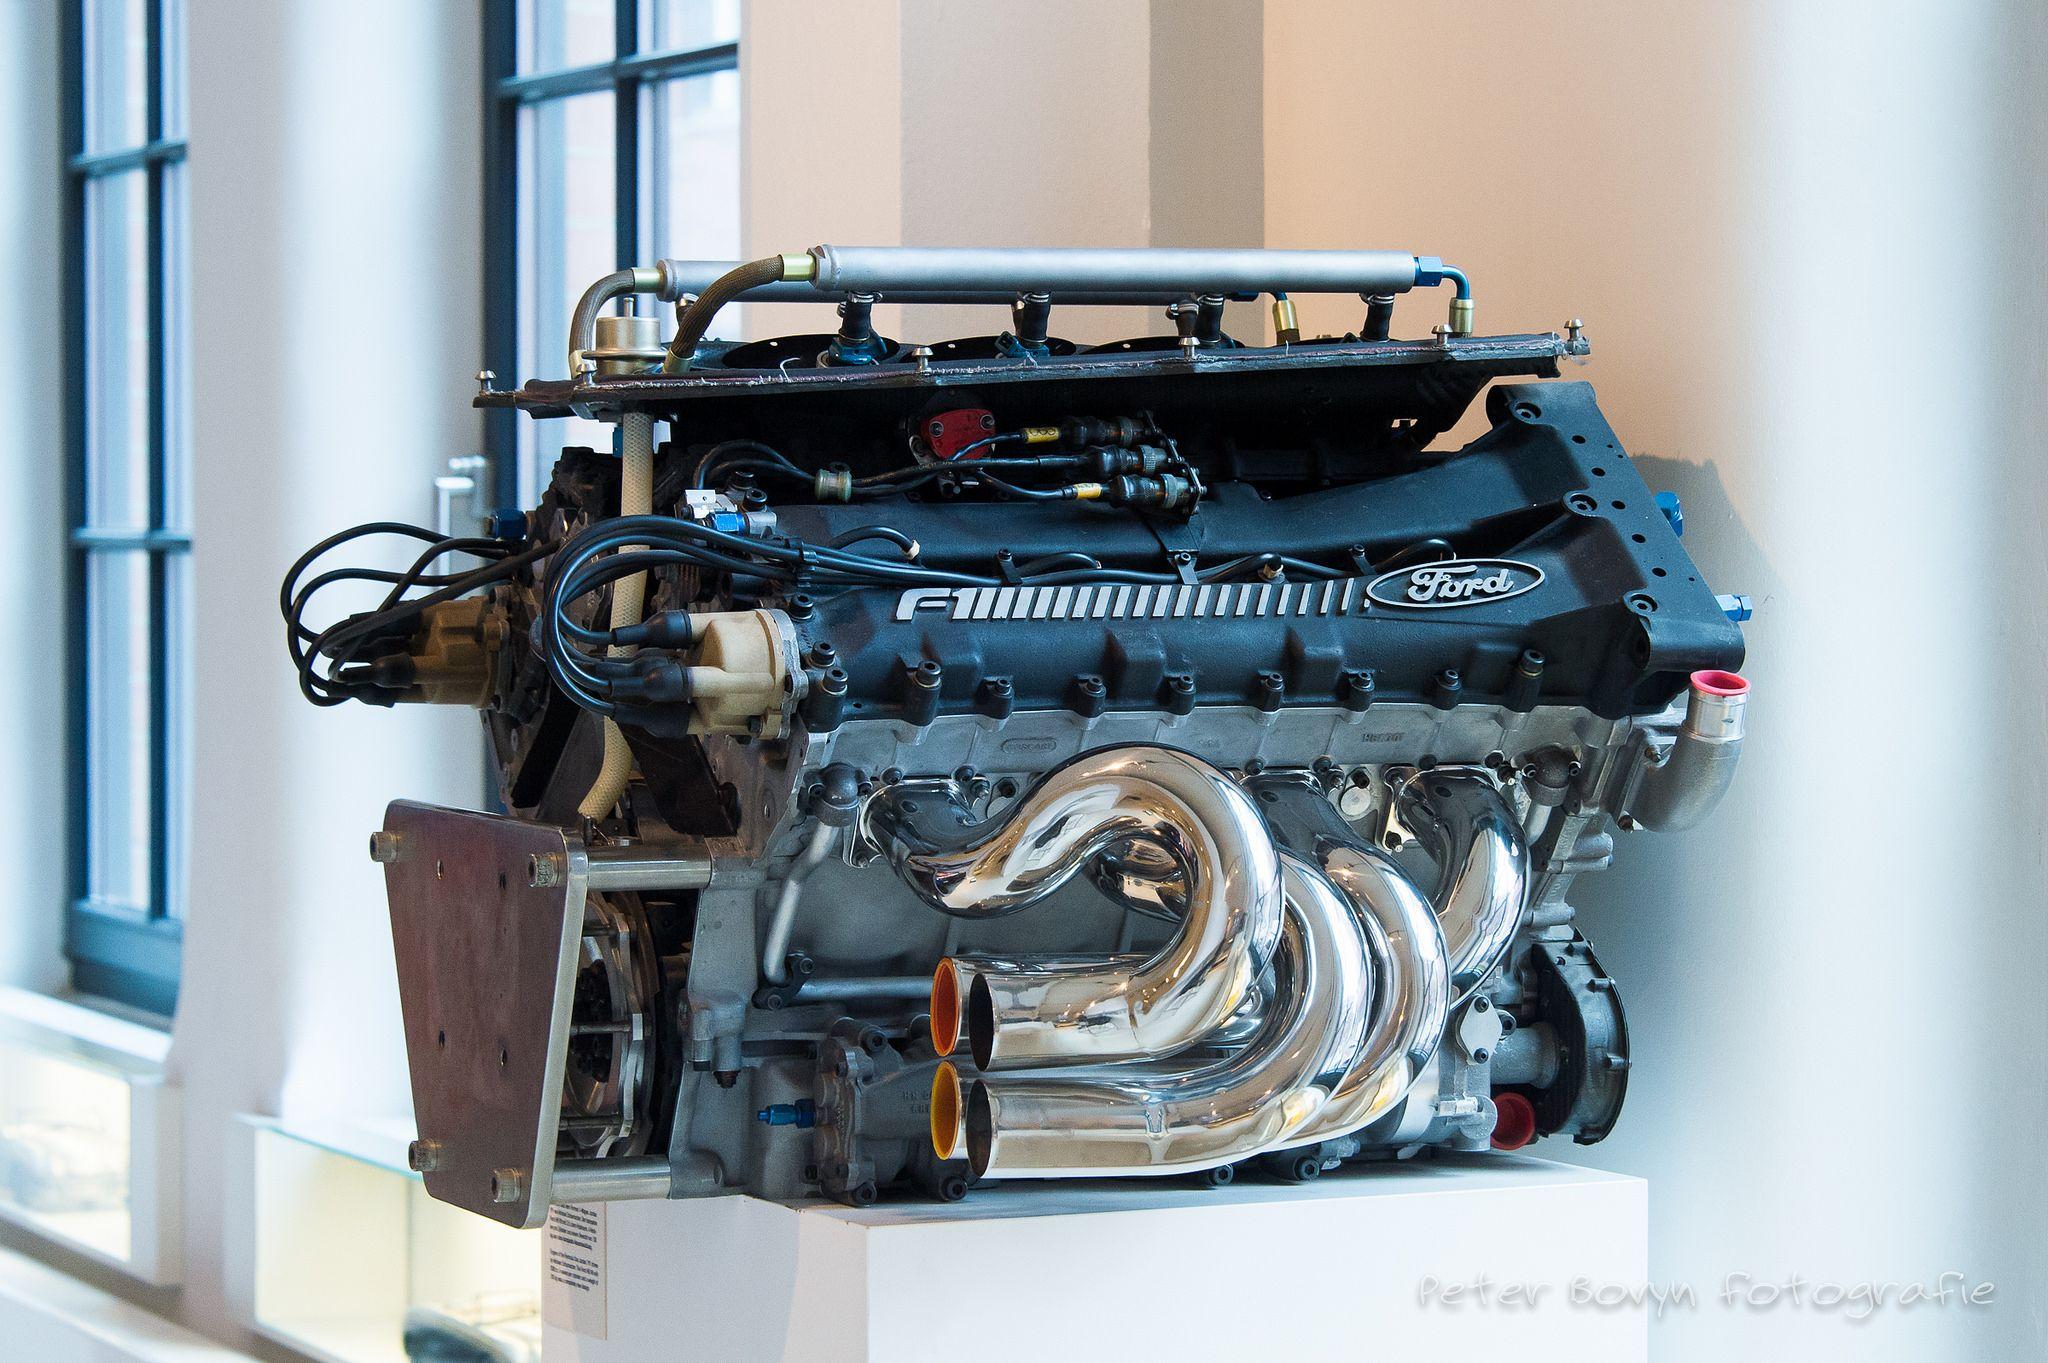 Jordan 191 Michael Schumacher —— Ford Cosworth HB4 3,5 V8